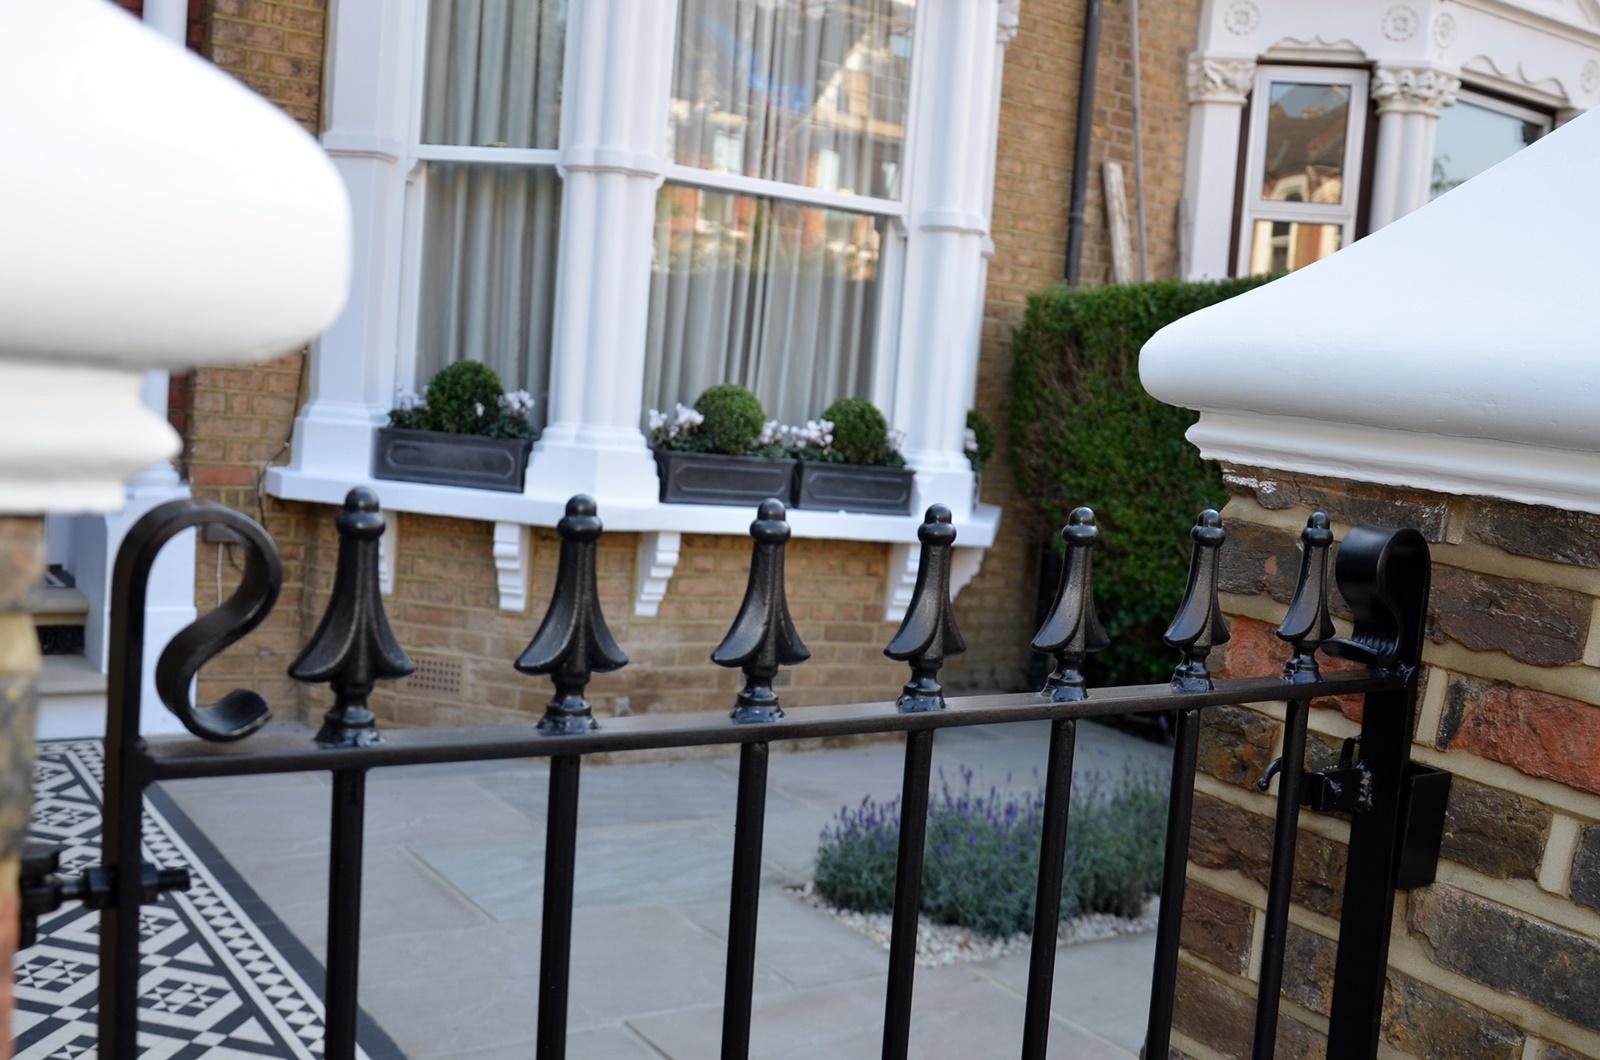 metal-gate-rails-white-cap-brick-garden-wall-low-maintenance-london-balham-clapham-wandsworth